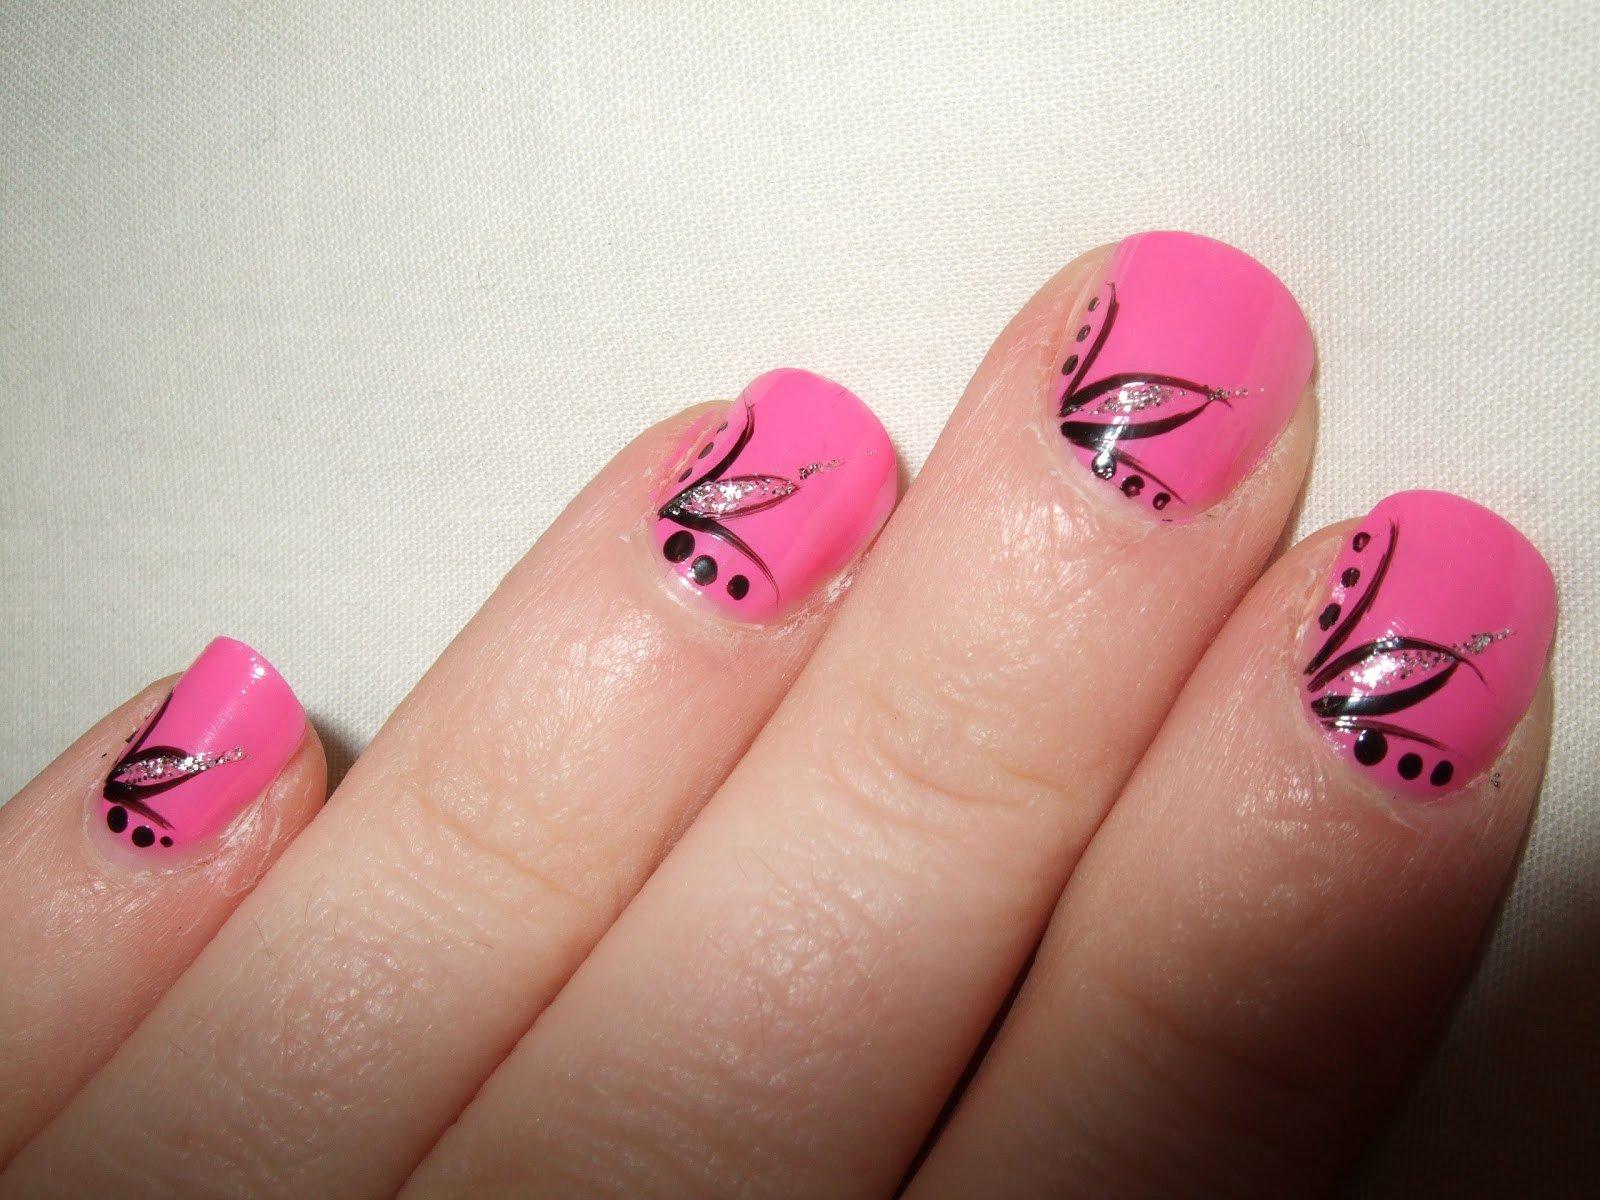 Toe Nail Art Easy New Oooooh Pretty My First Ever Nail Art Design